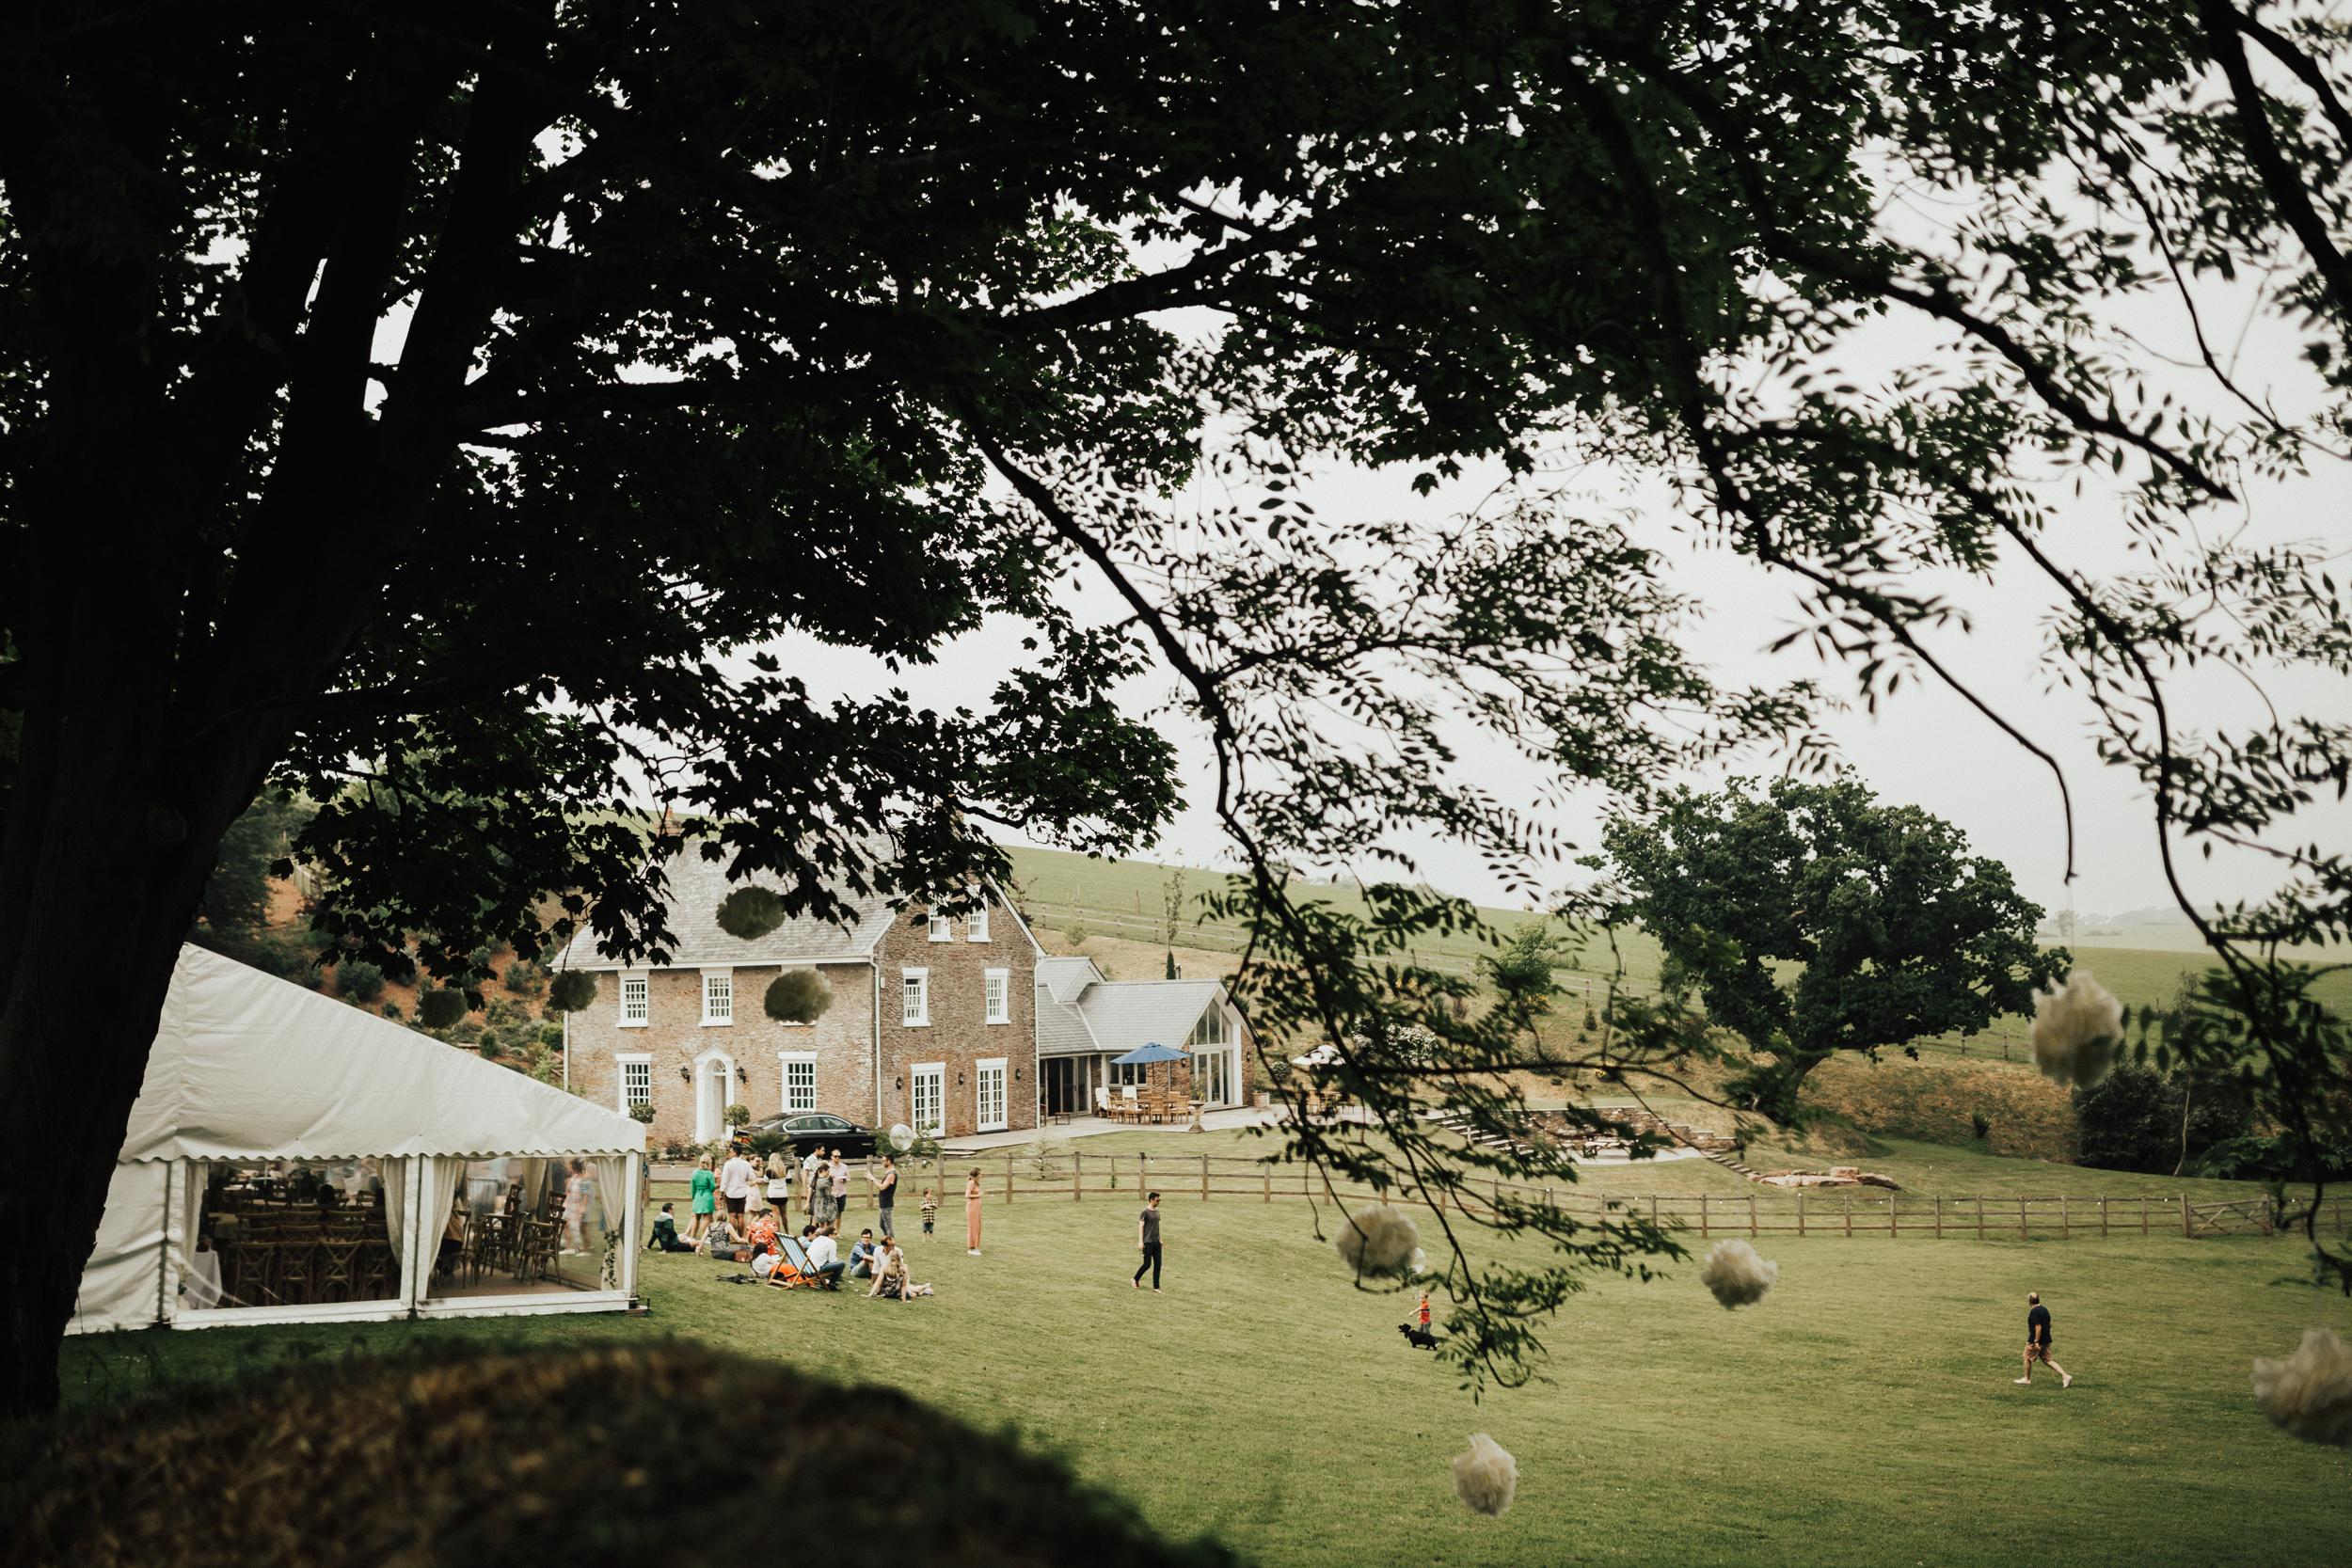 Rach-Stefan-Wedding-Devon-South-Slapton-Sands-Boho-Photography-Darina-Stoda-Day-After-11.jpg